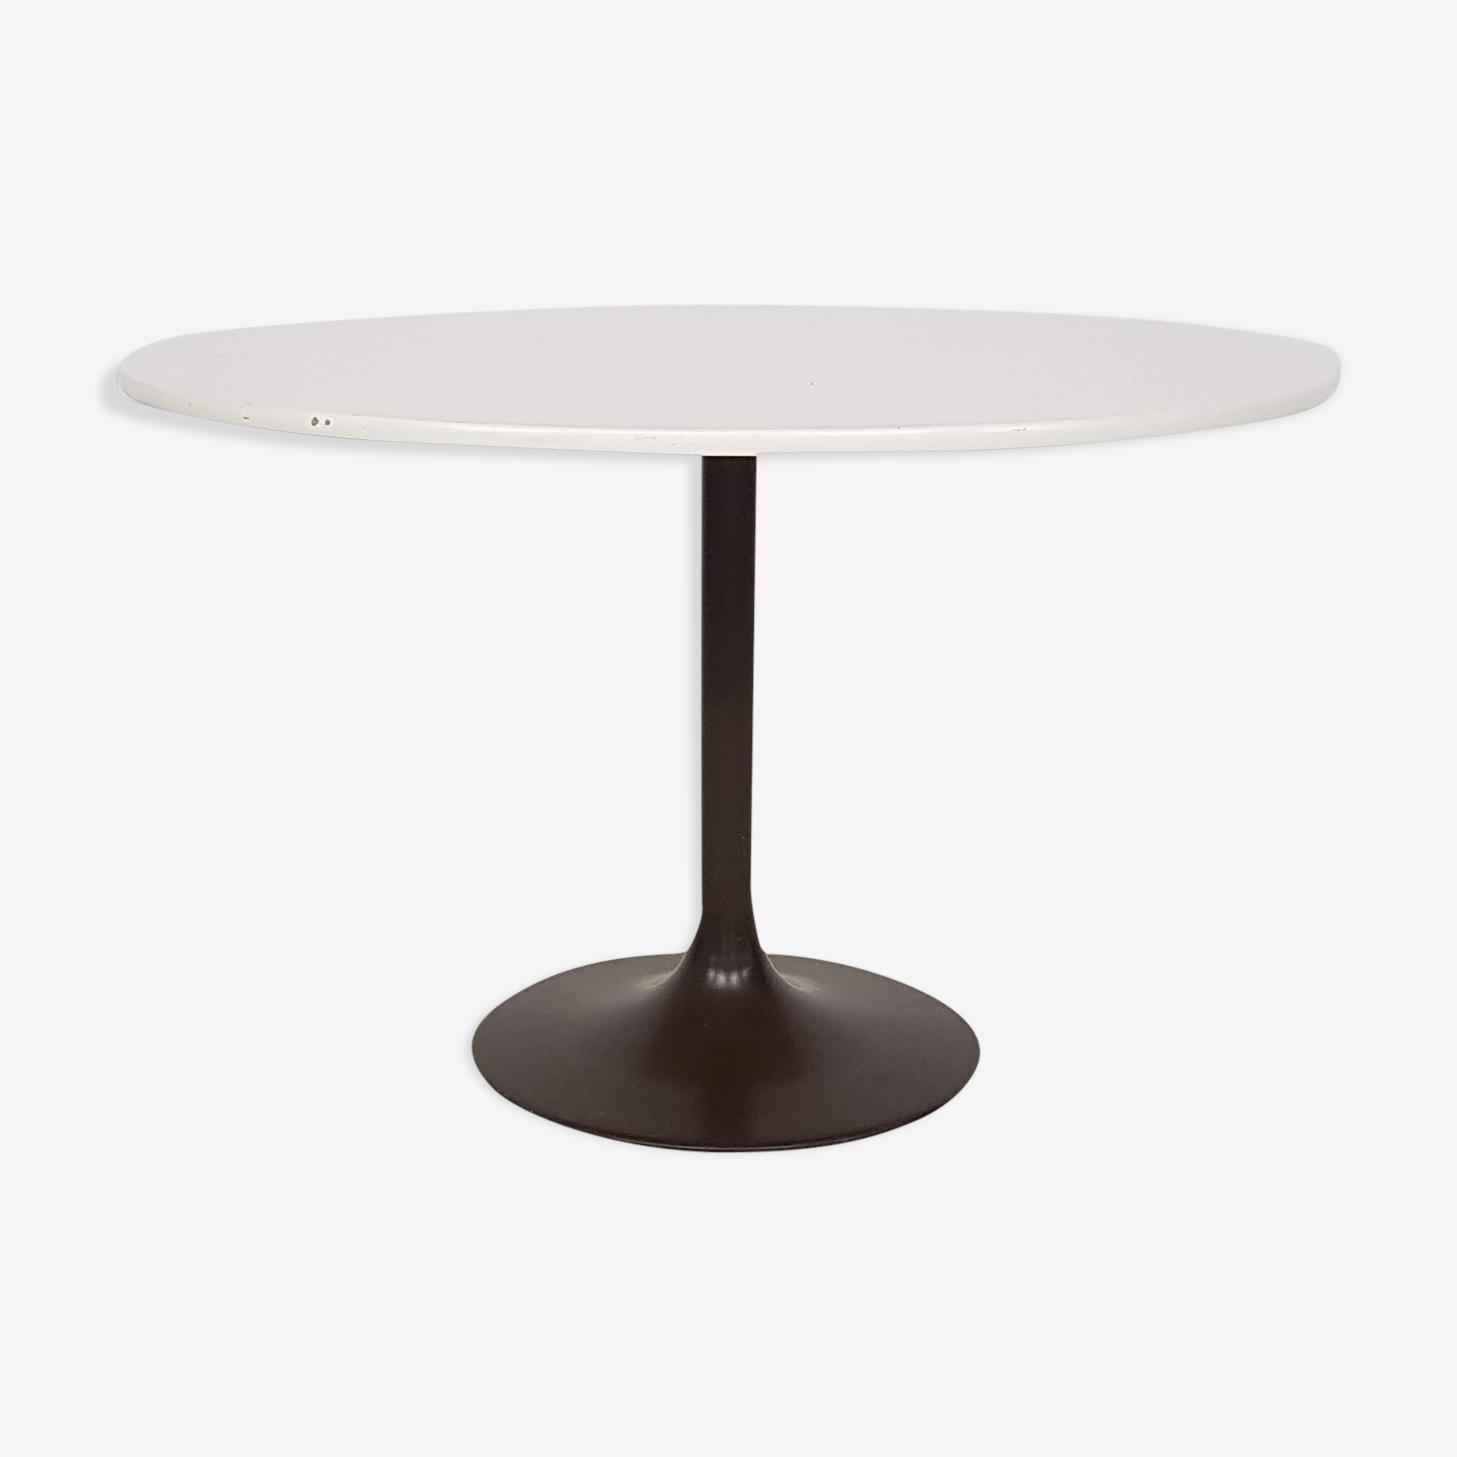 Borge Johanson for Johanson Design, Markaryd 'Tulip' table, Sweden, 68